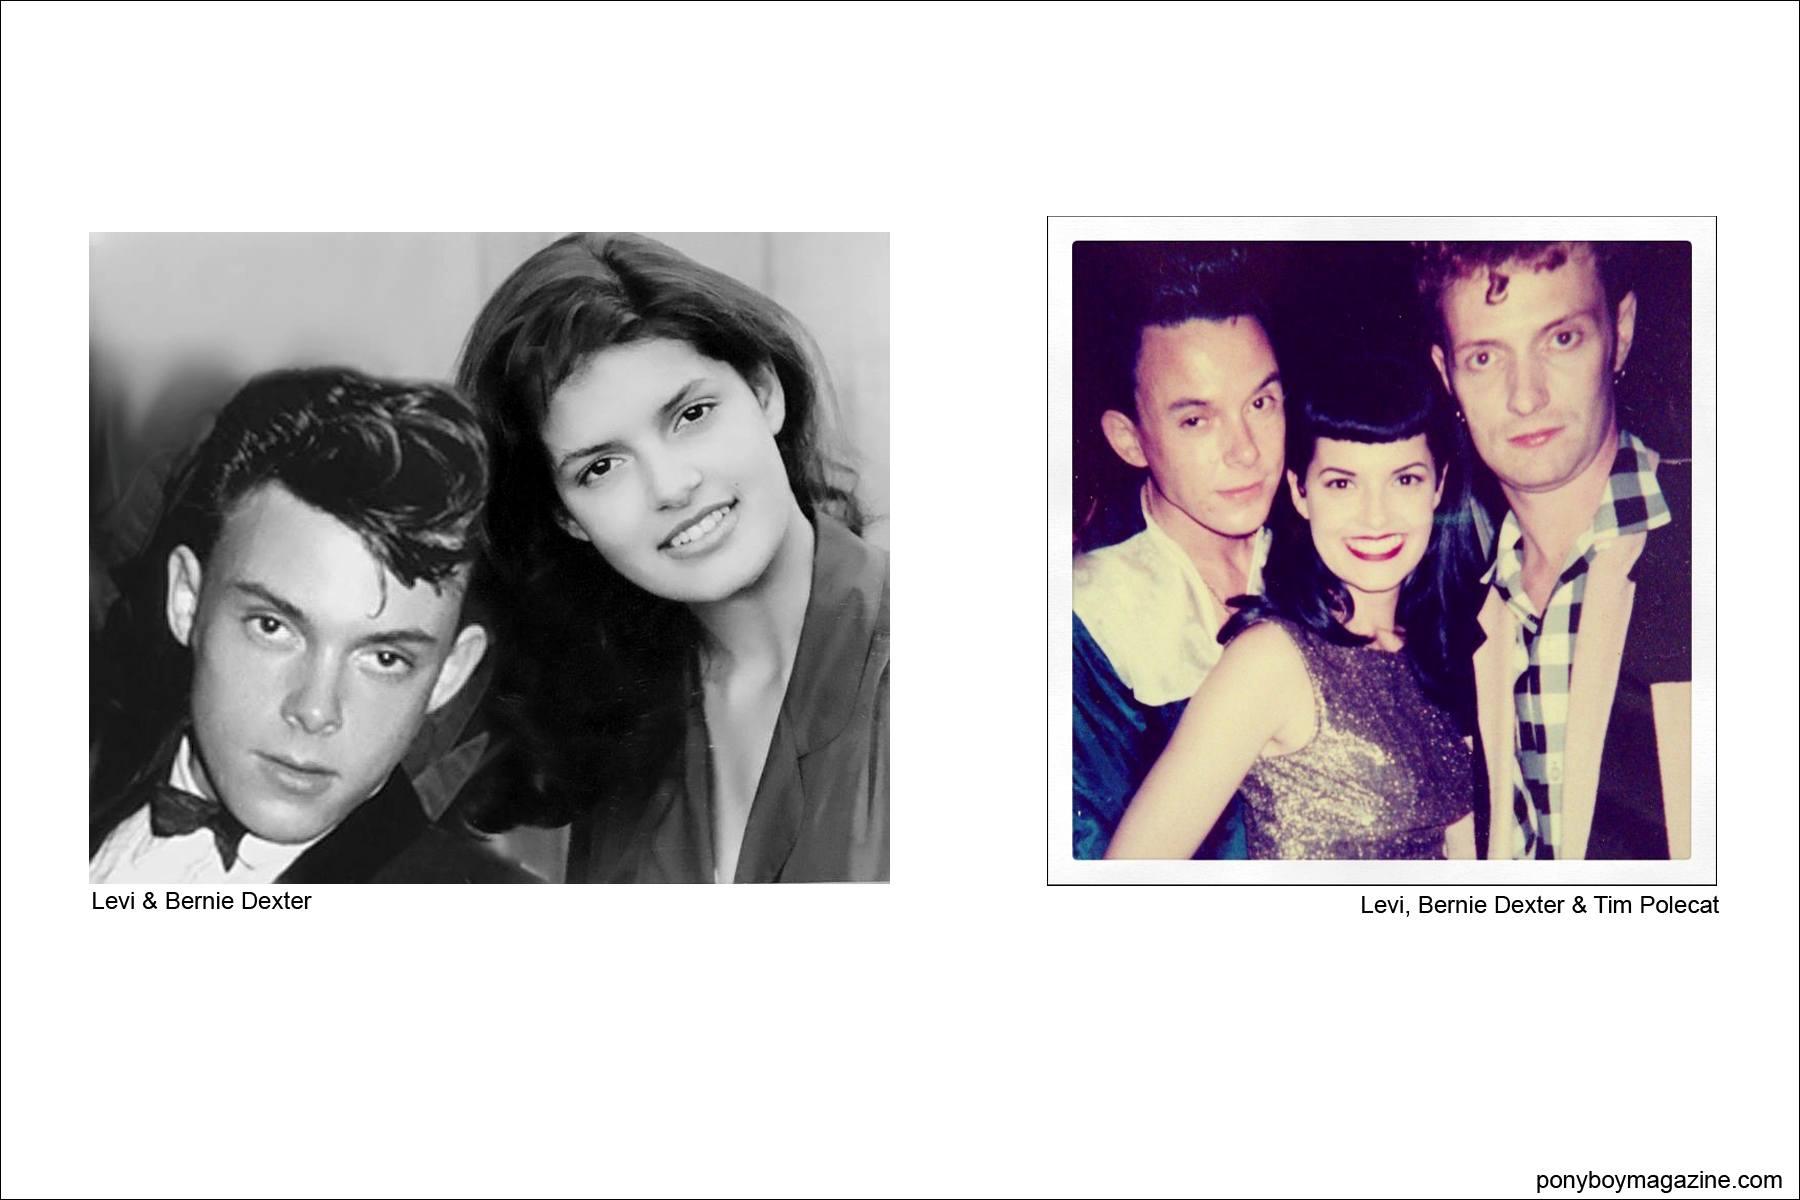 Levi Dexter with wife/model Bernie Dexter, as well as Tim Polecat, Ponyboy Magazine.